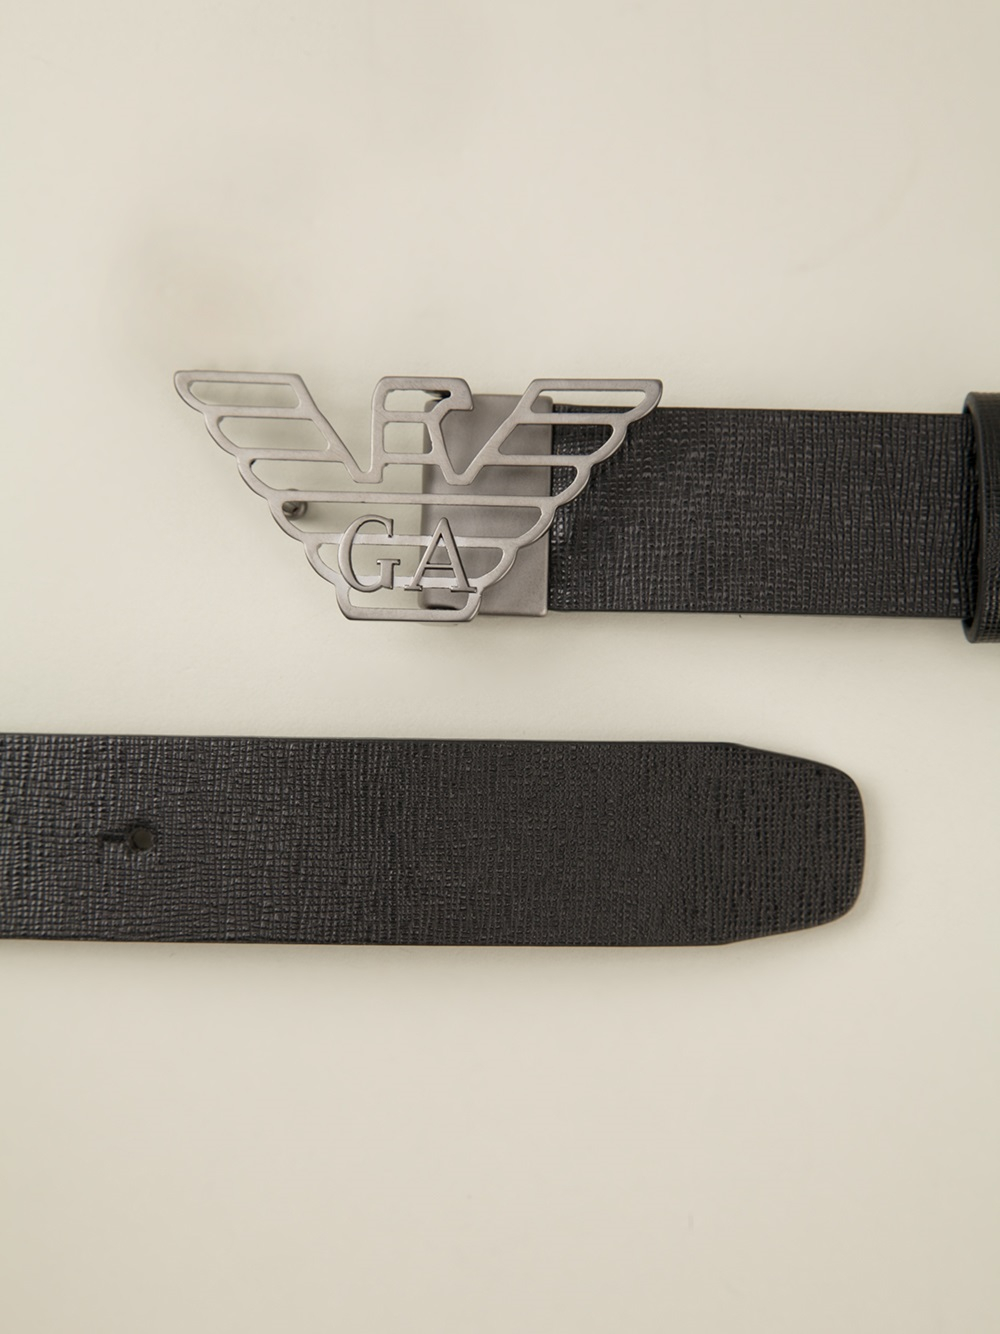 Lyst - Emporio Armani Logo Belt in Black for Men